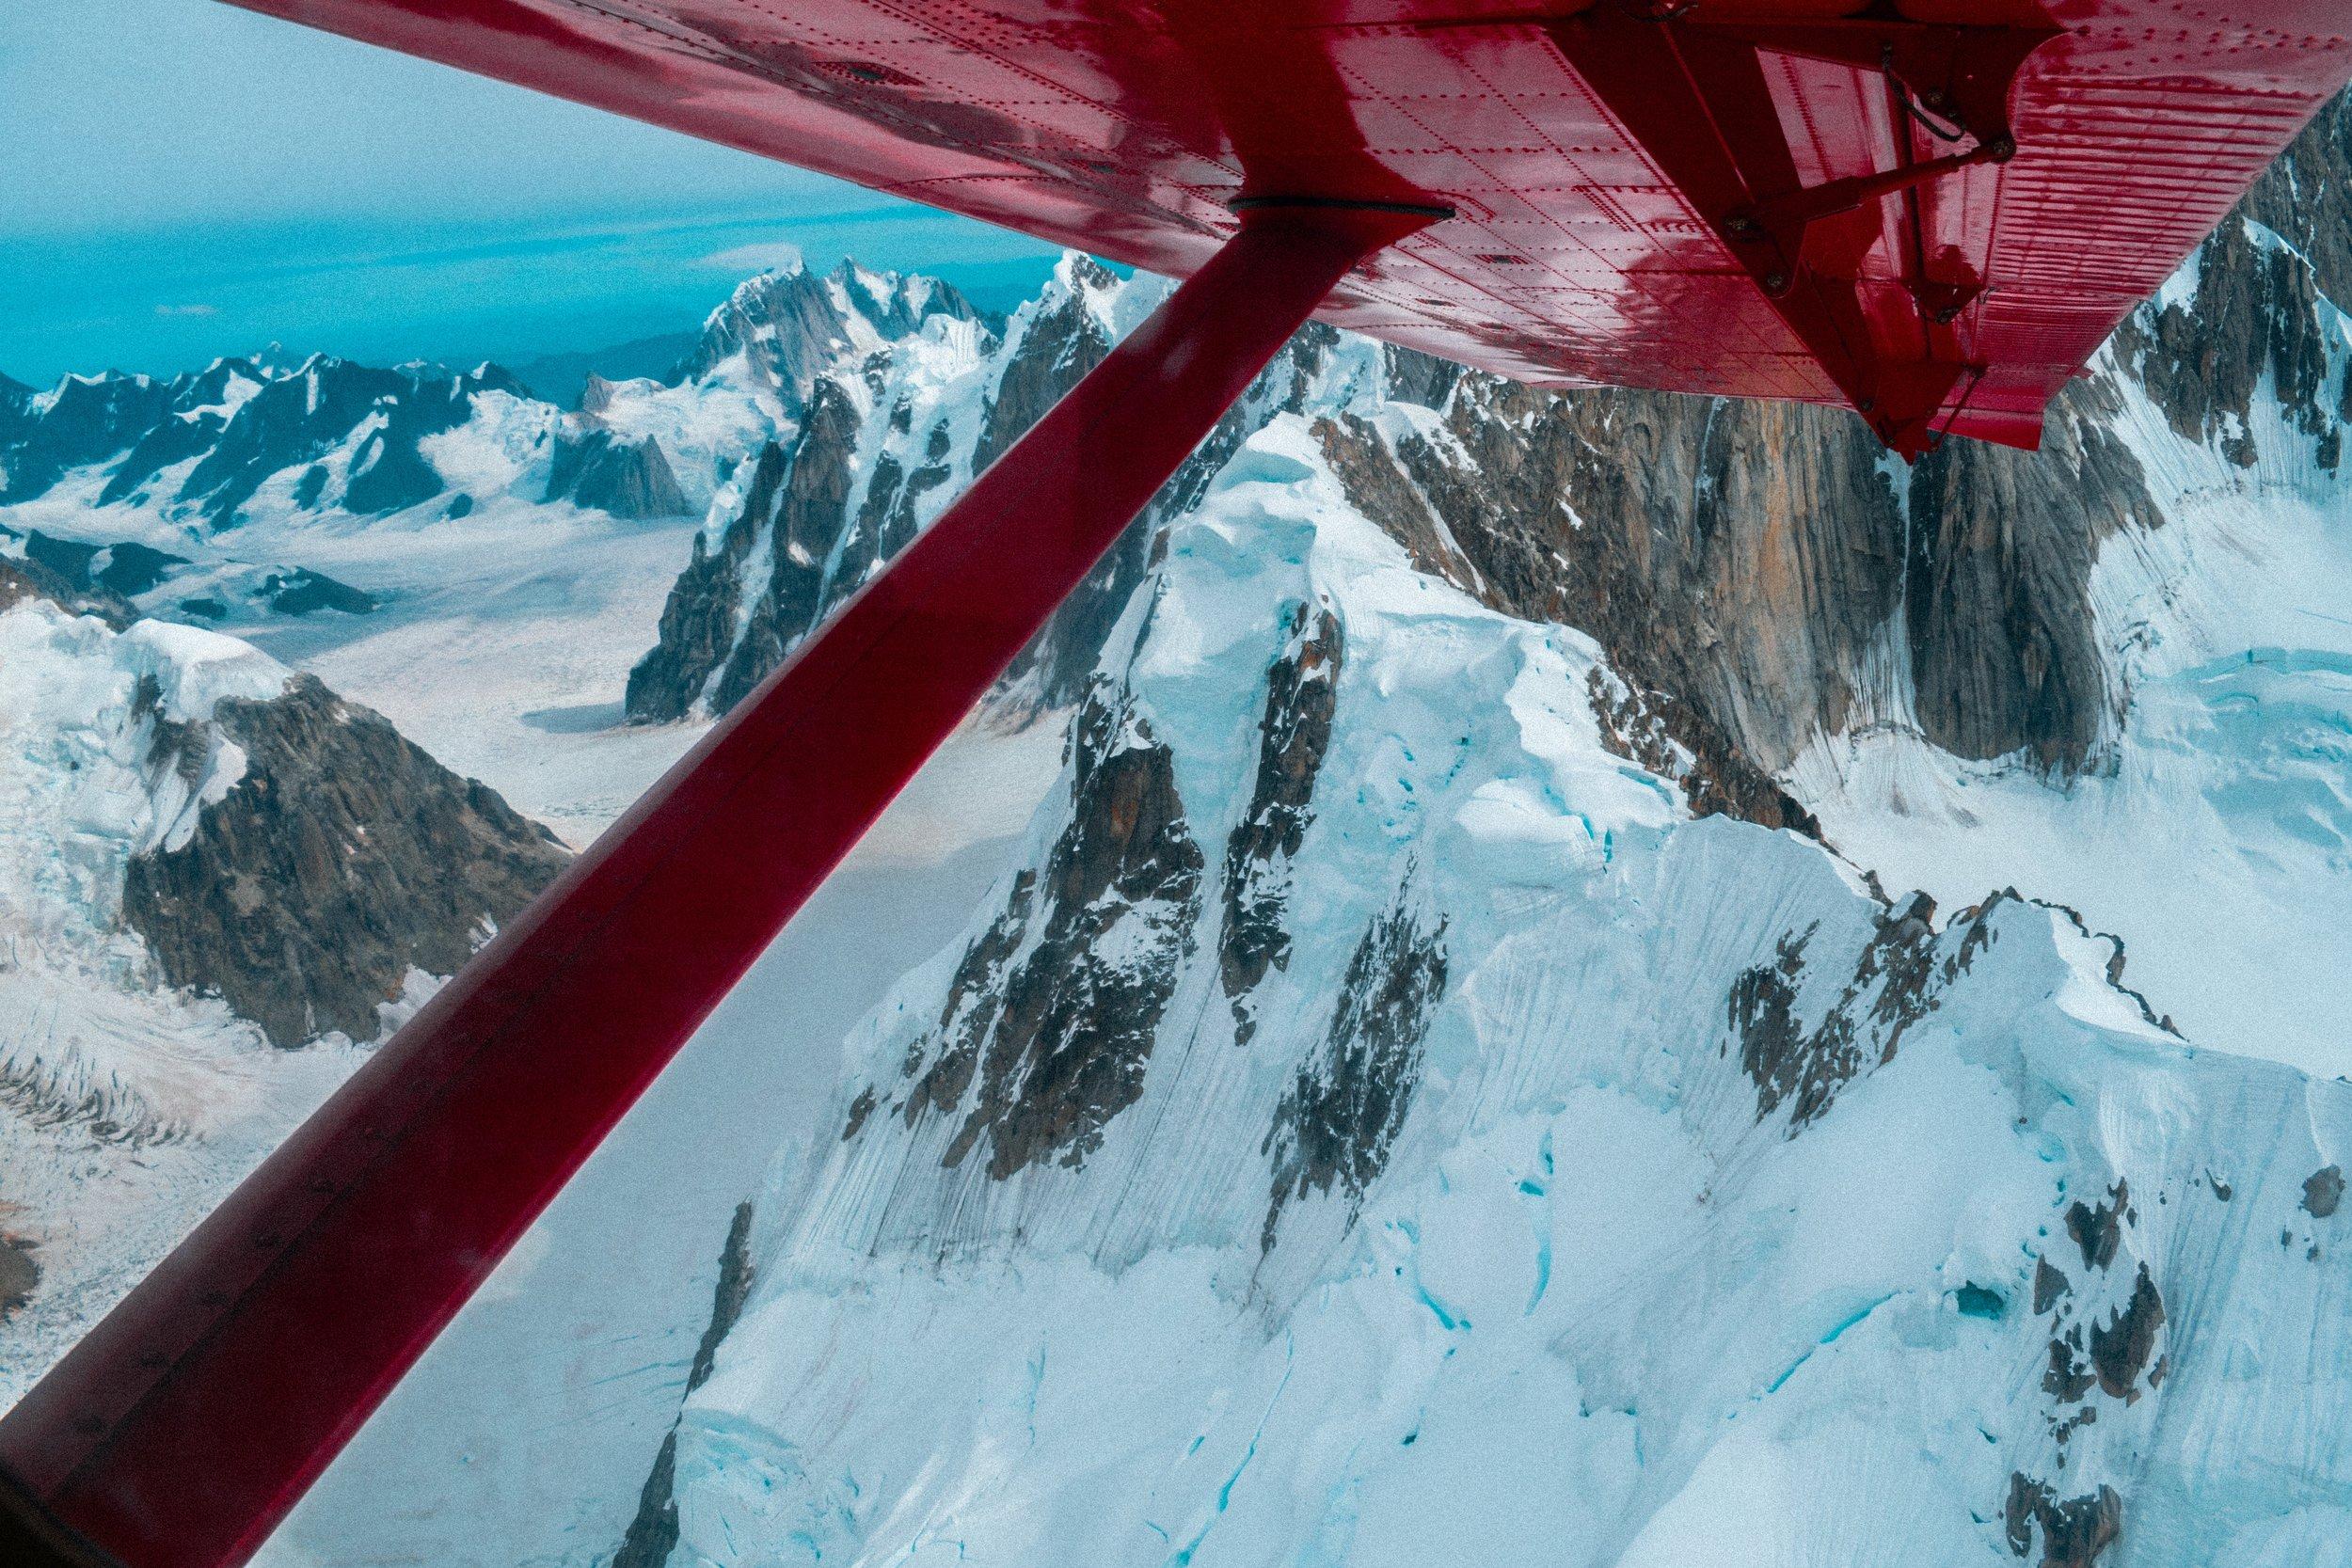 Photo 111 - Karakorams out of an Airplane.jpg